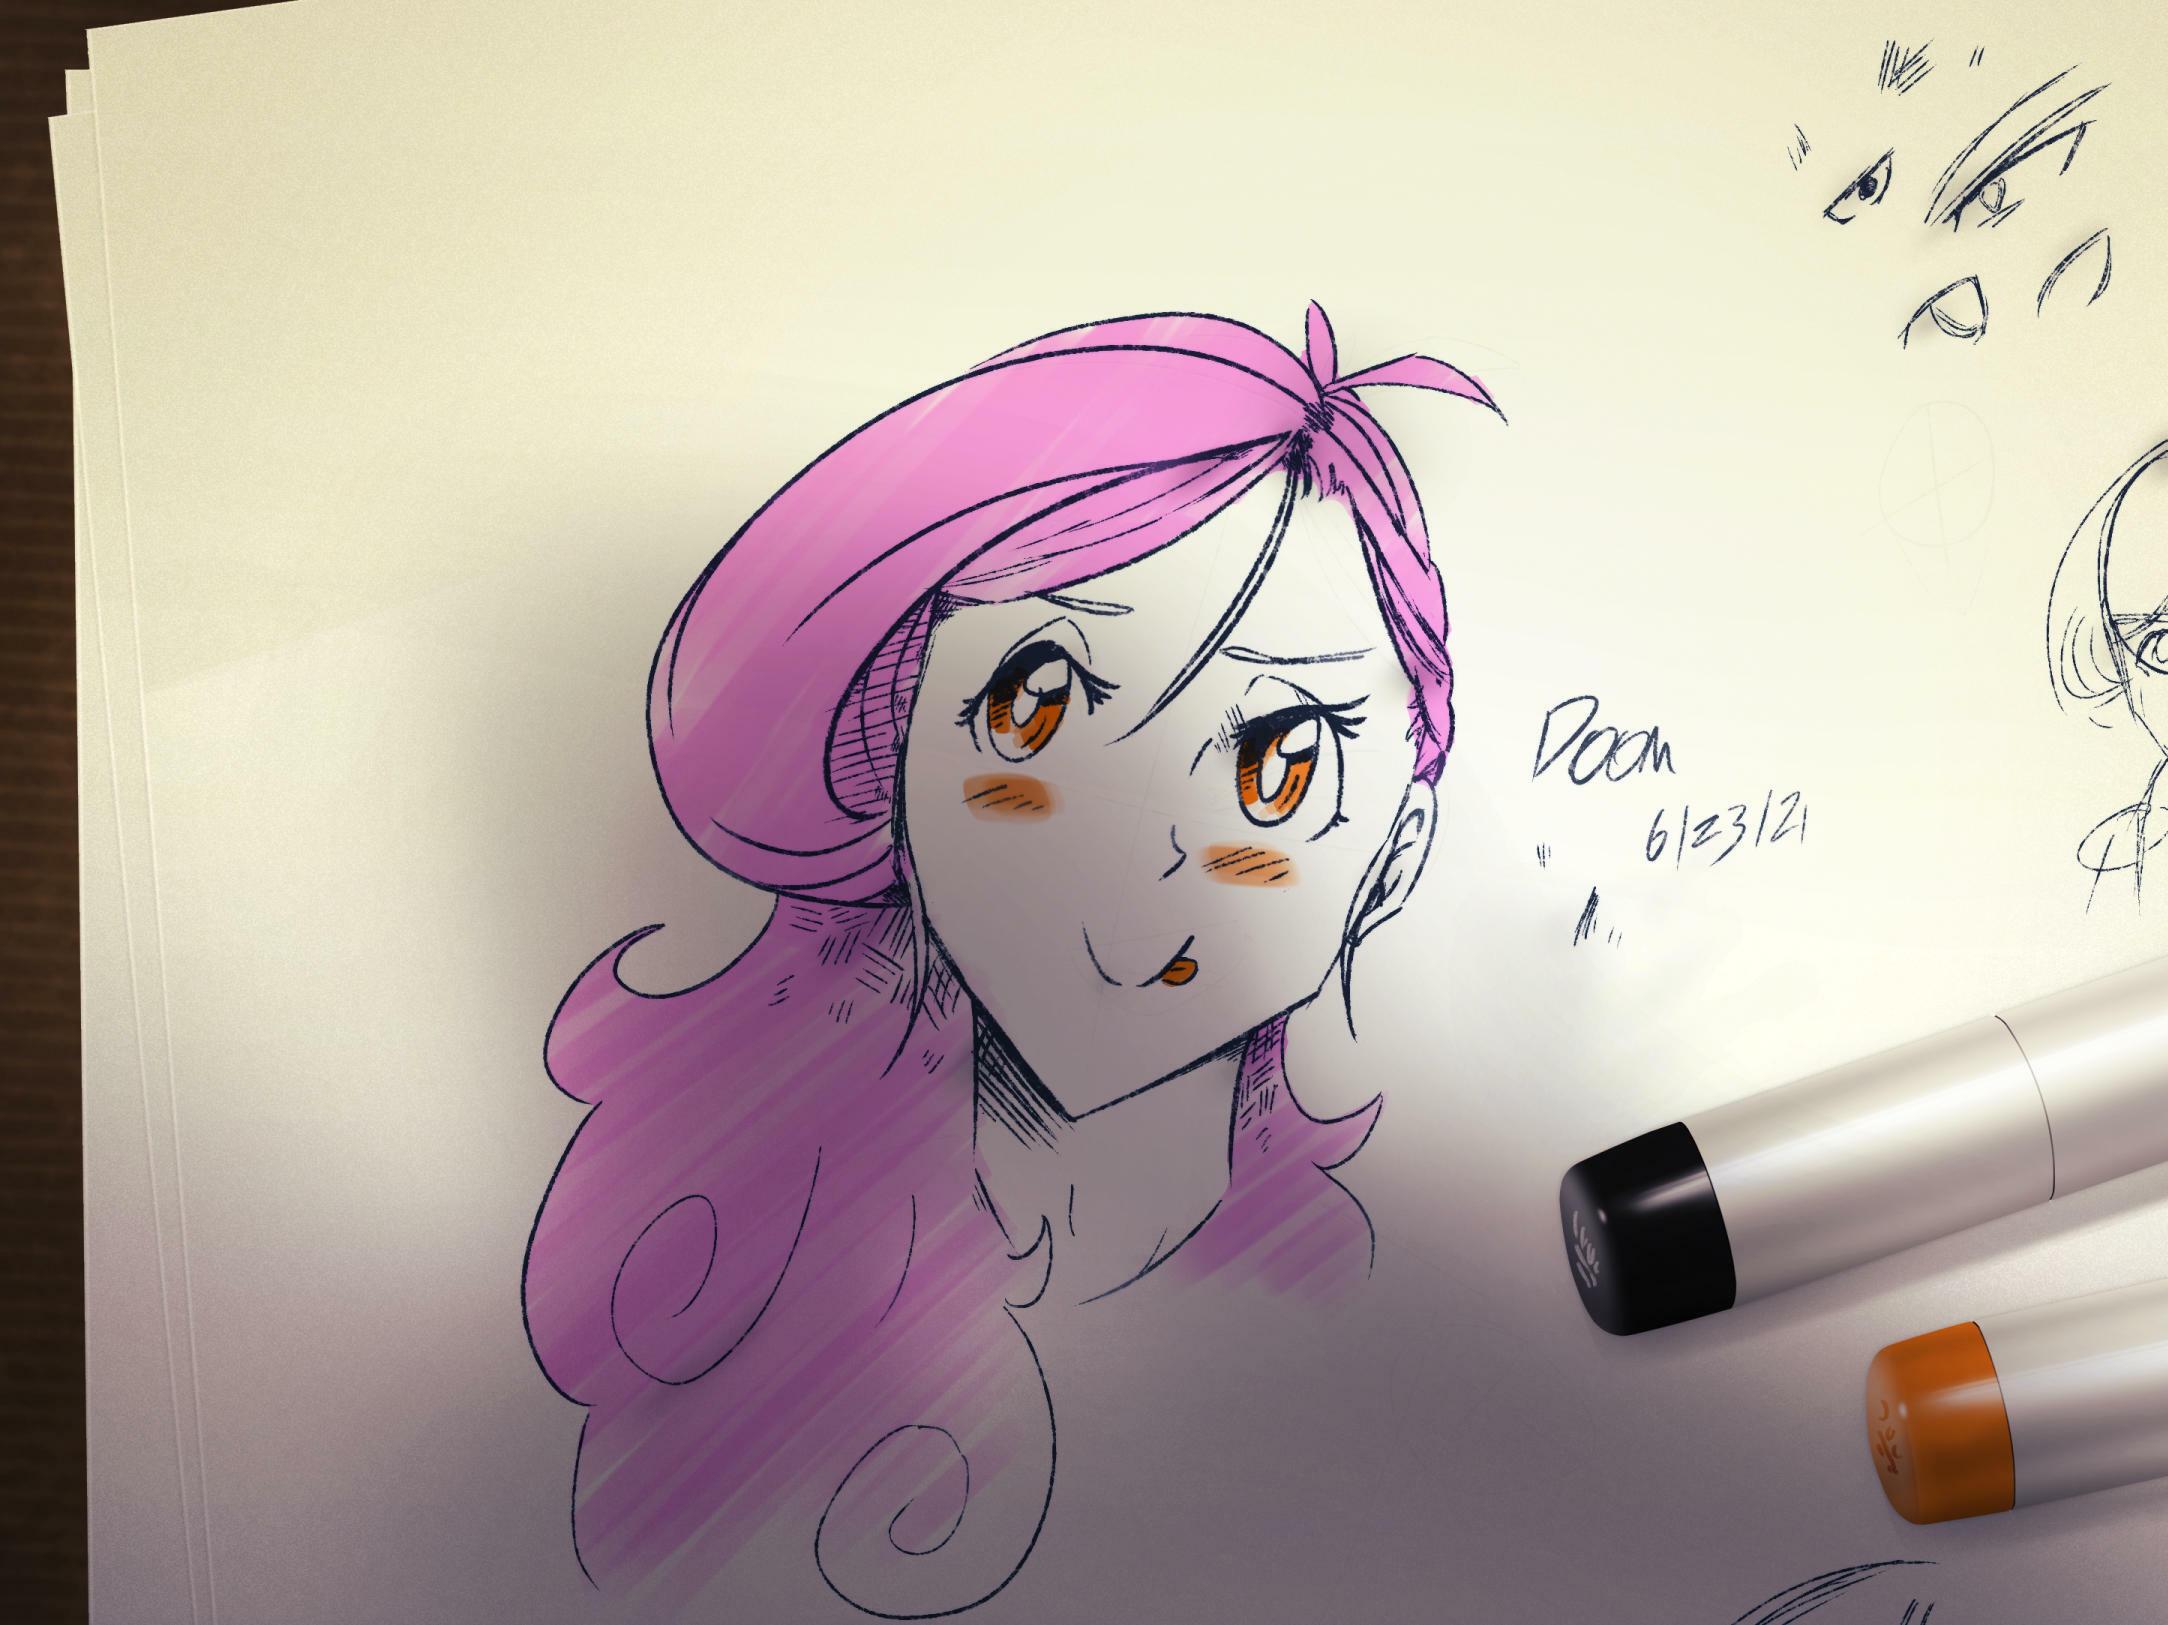 Vera doodle